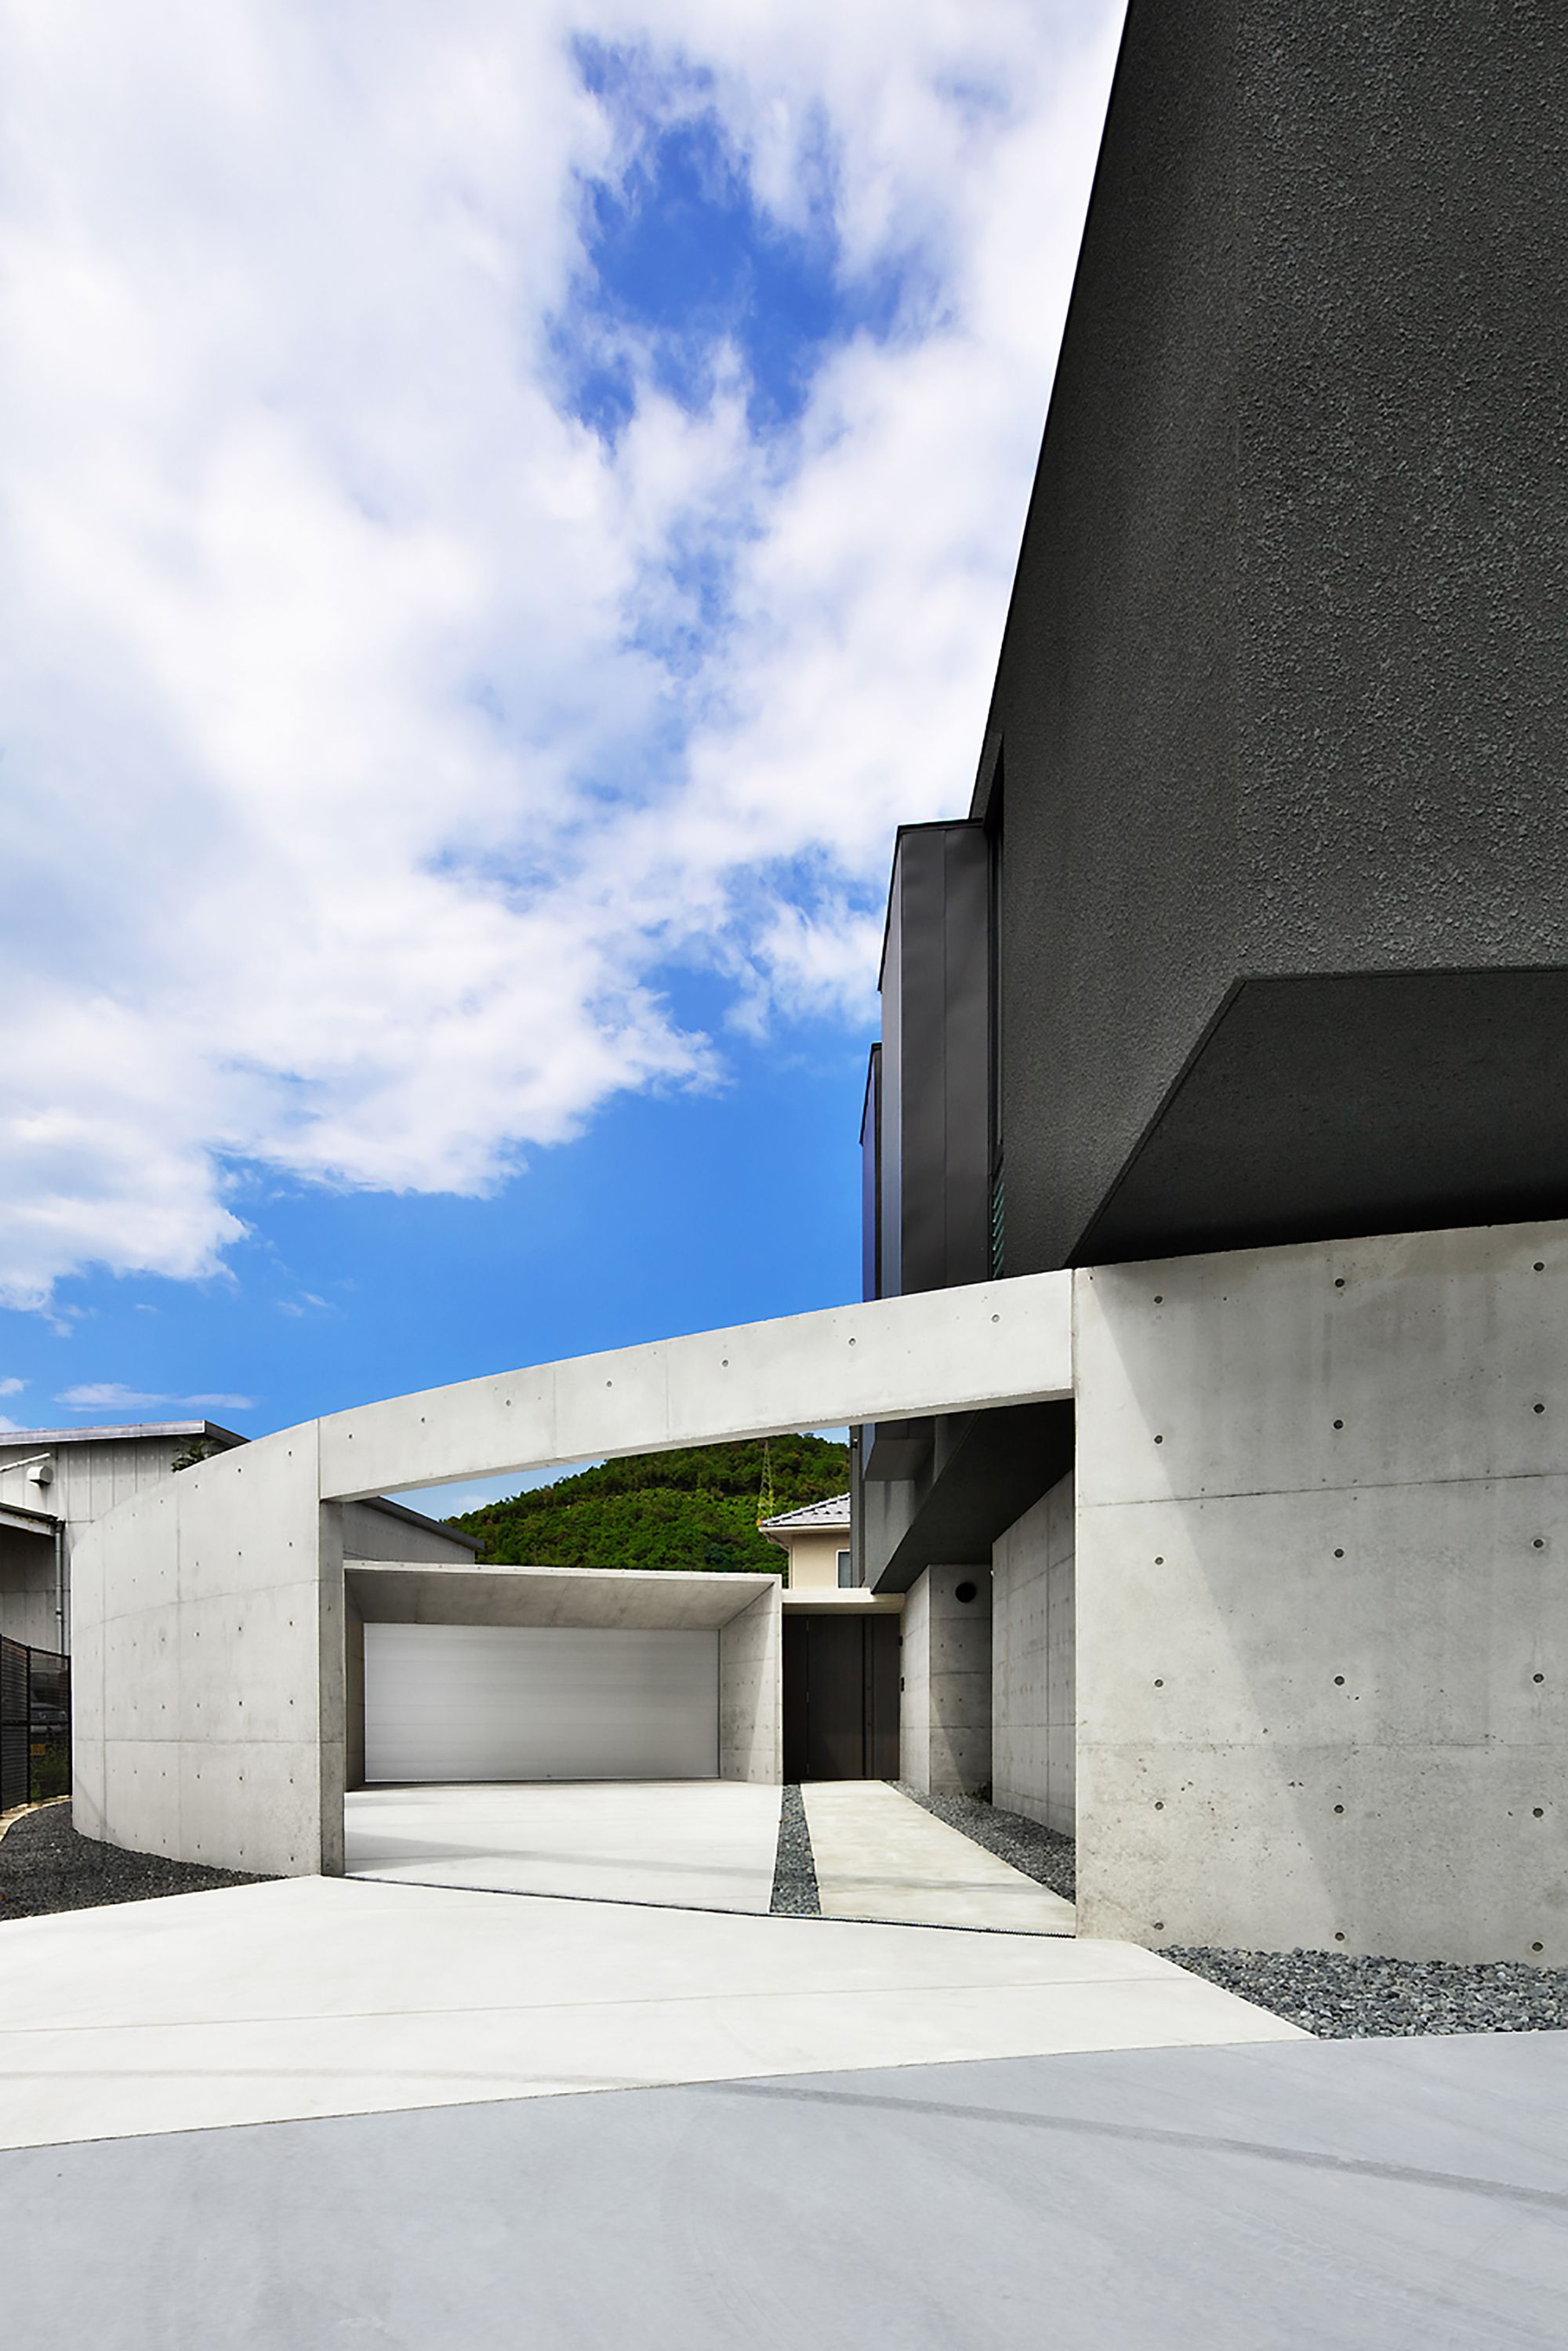 Floating House / Satoru Hirota Architects